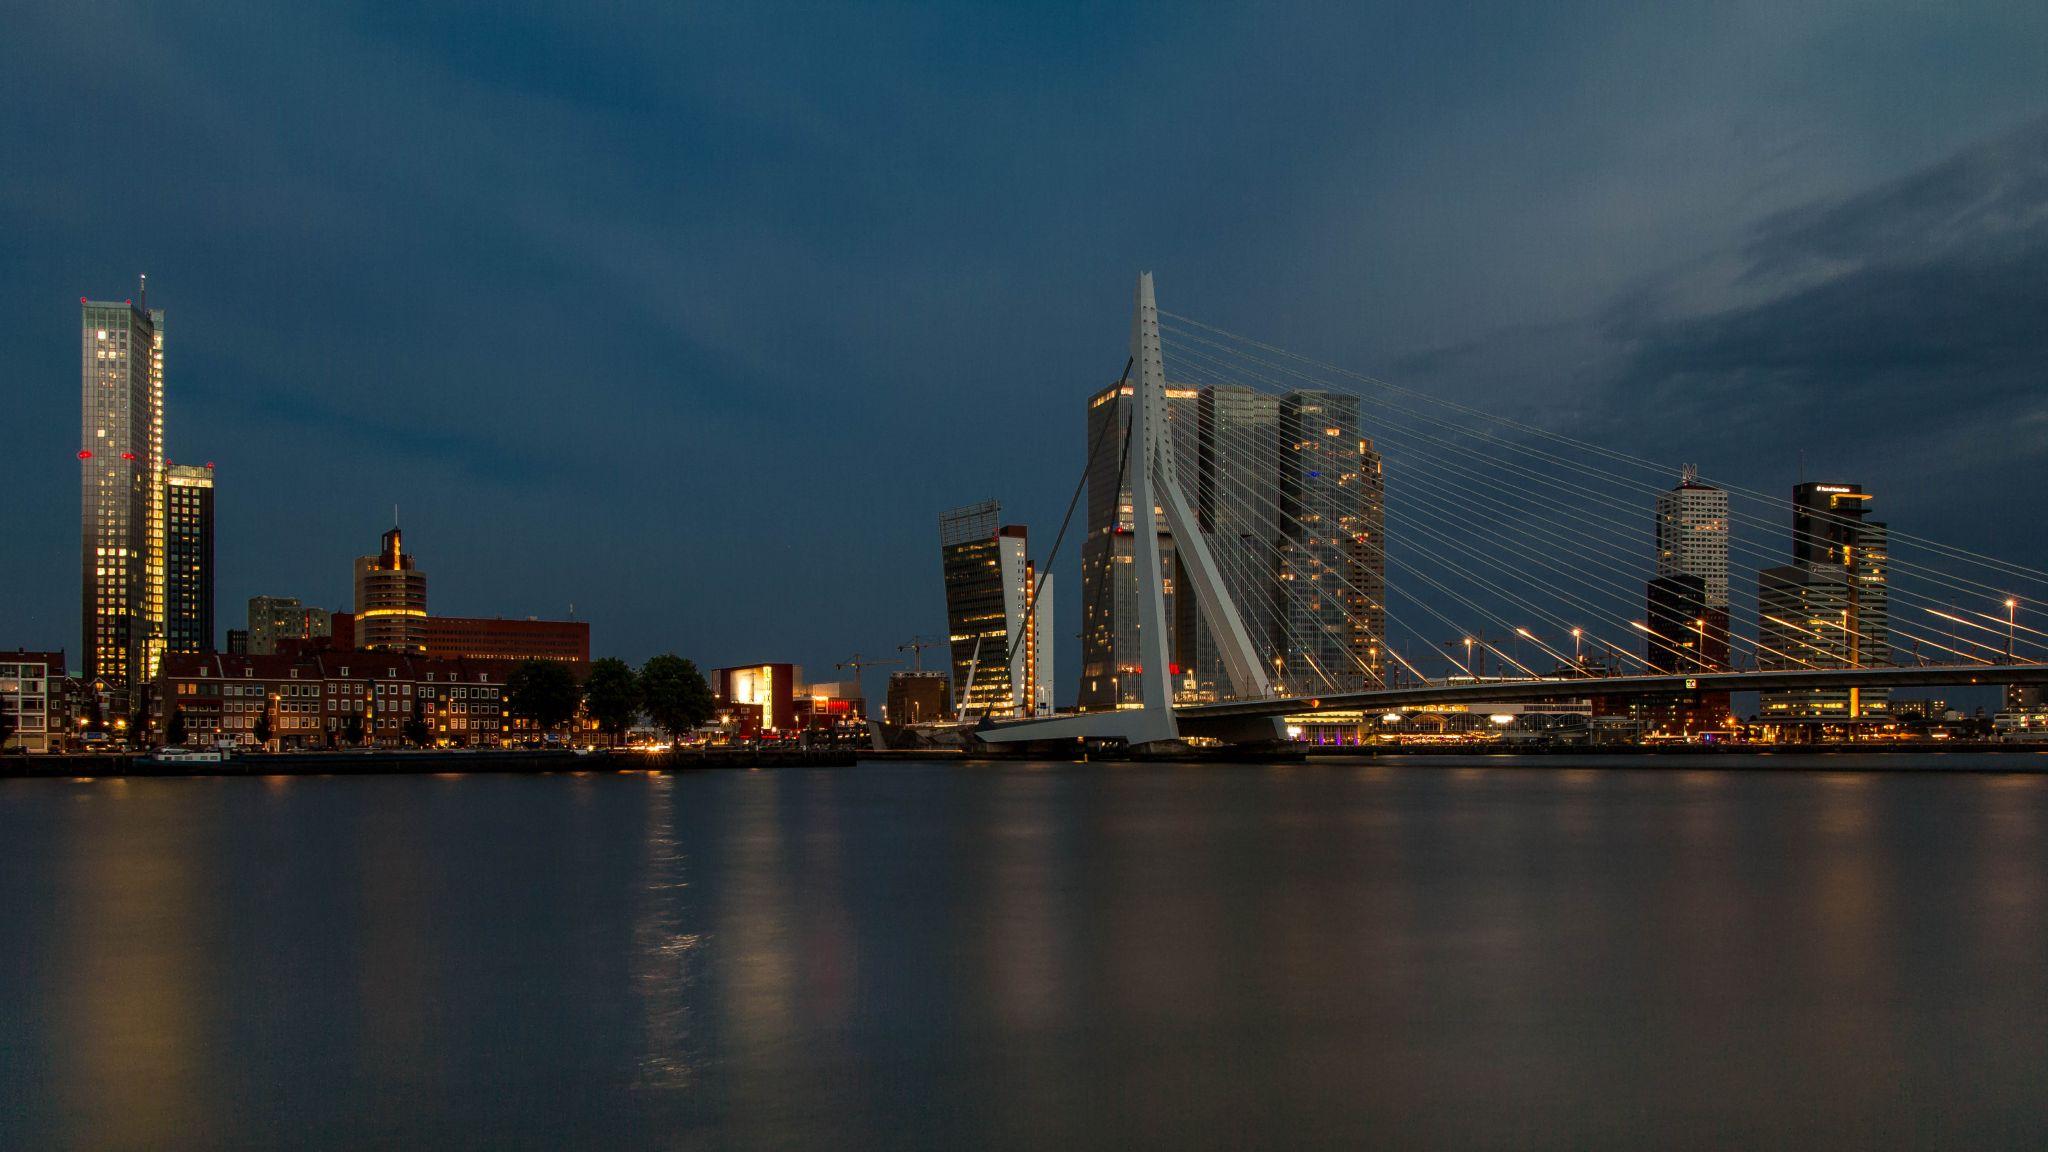 Erasmusbridge, Netherlands